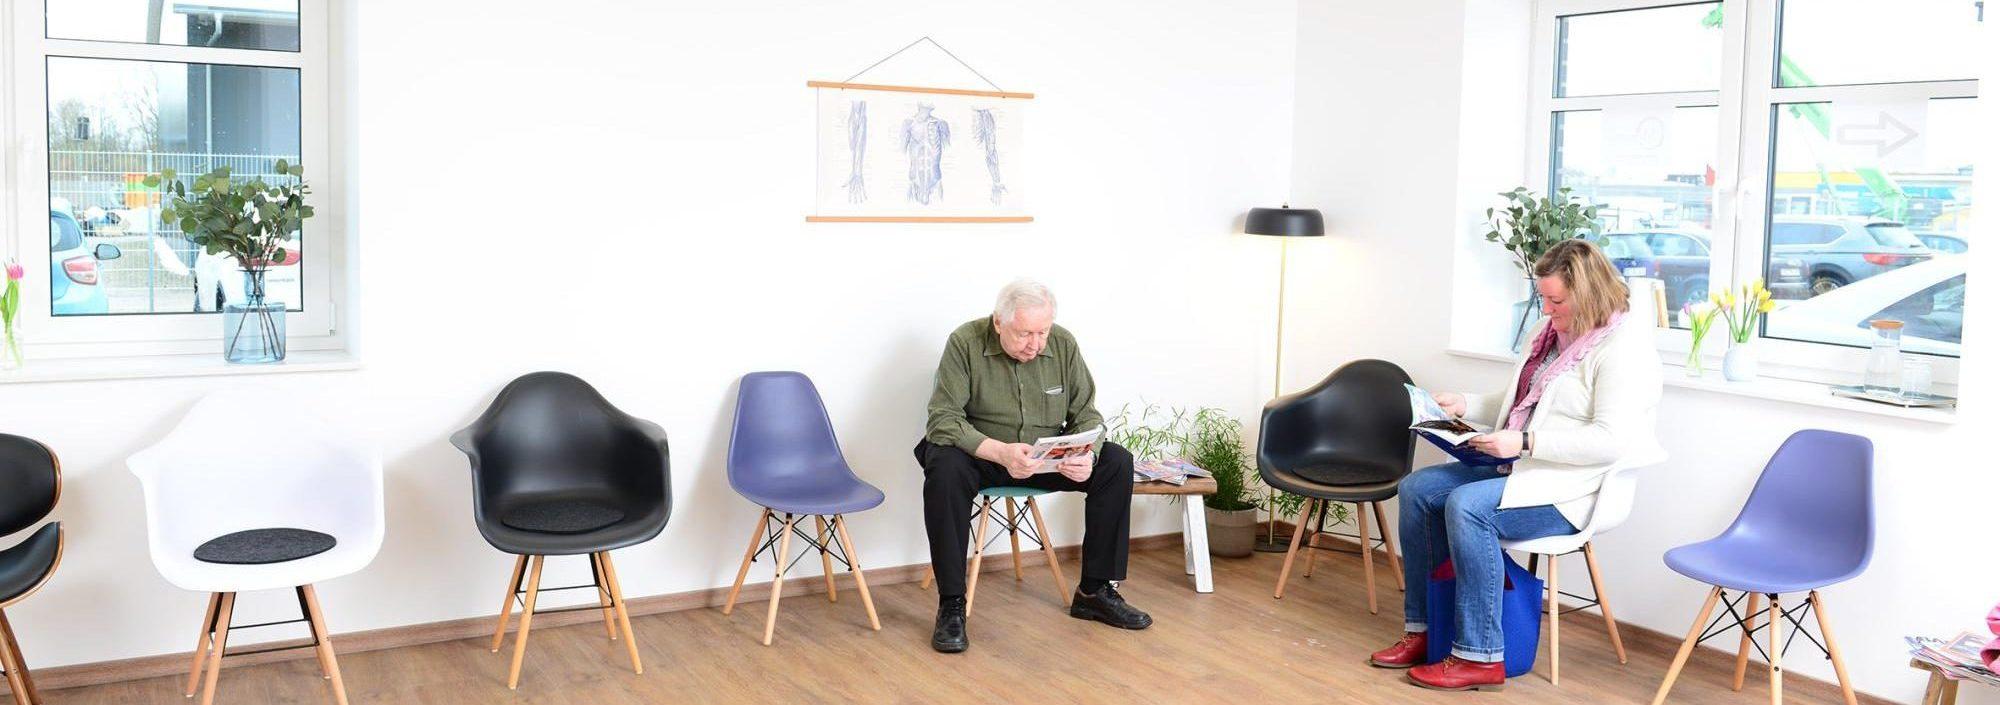 MOVENDUS - Physiotherapie Praxis in Kaltenkirchen